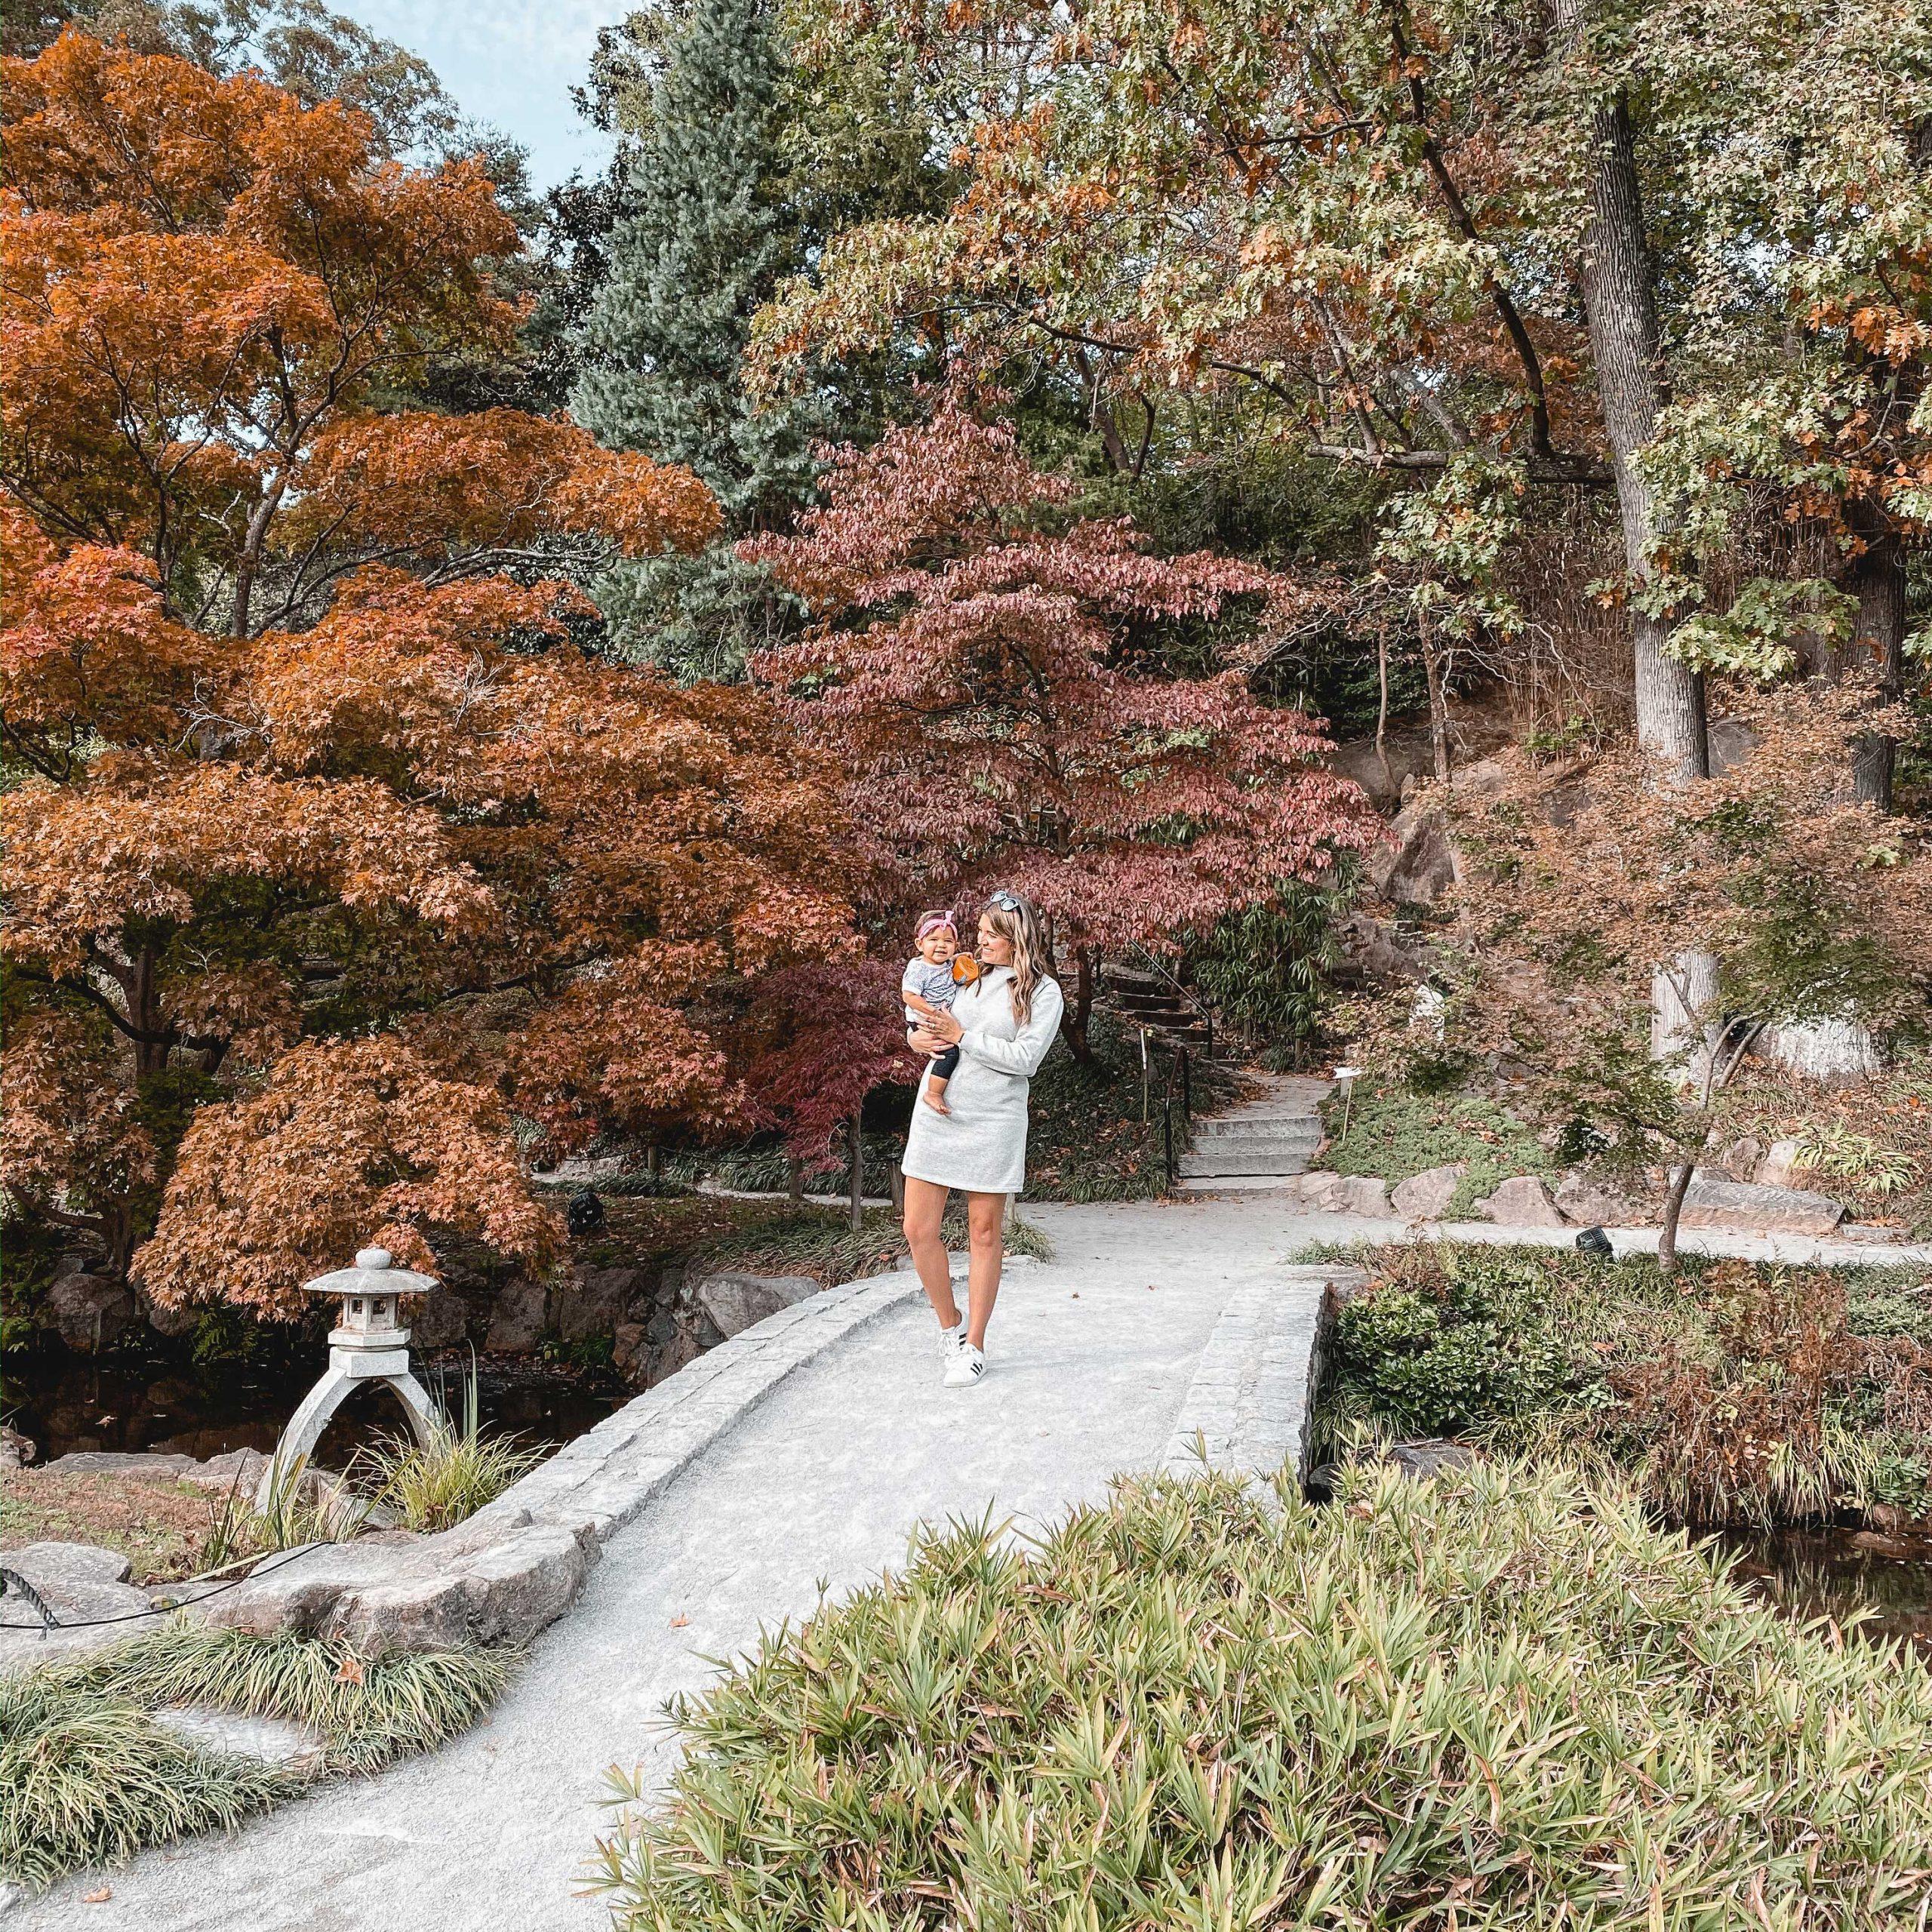 RVA blogger, Lauren Dix, shares all the best Instagram Spots in Richmond, VA! One of the best RVA photo spots is Maymont Park!